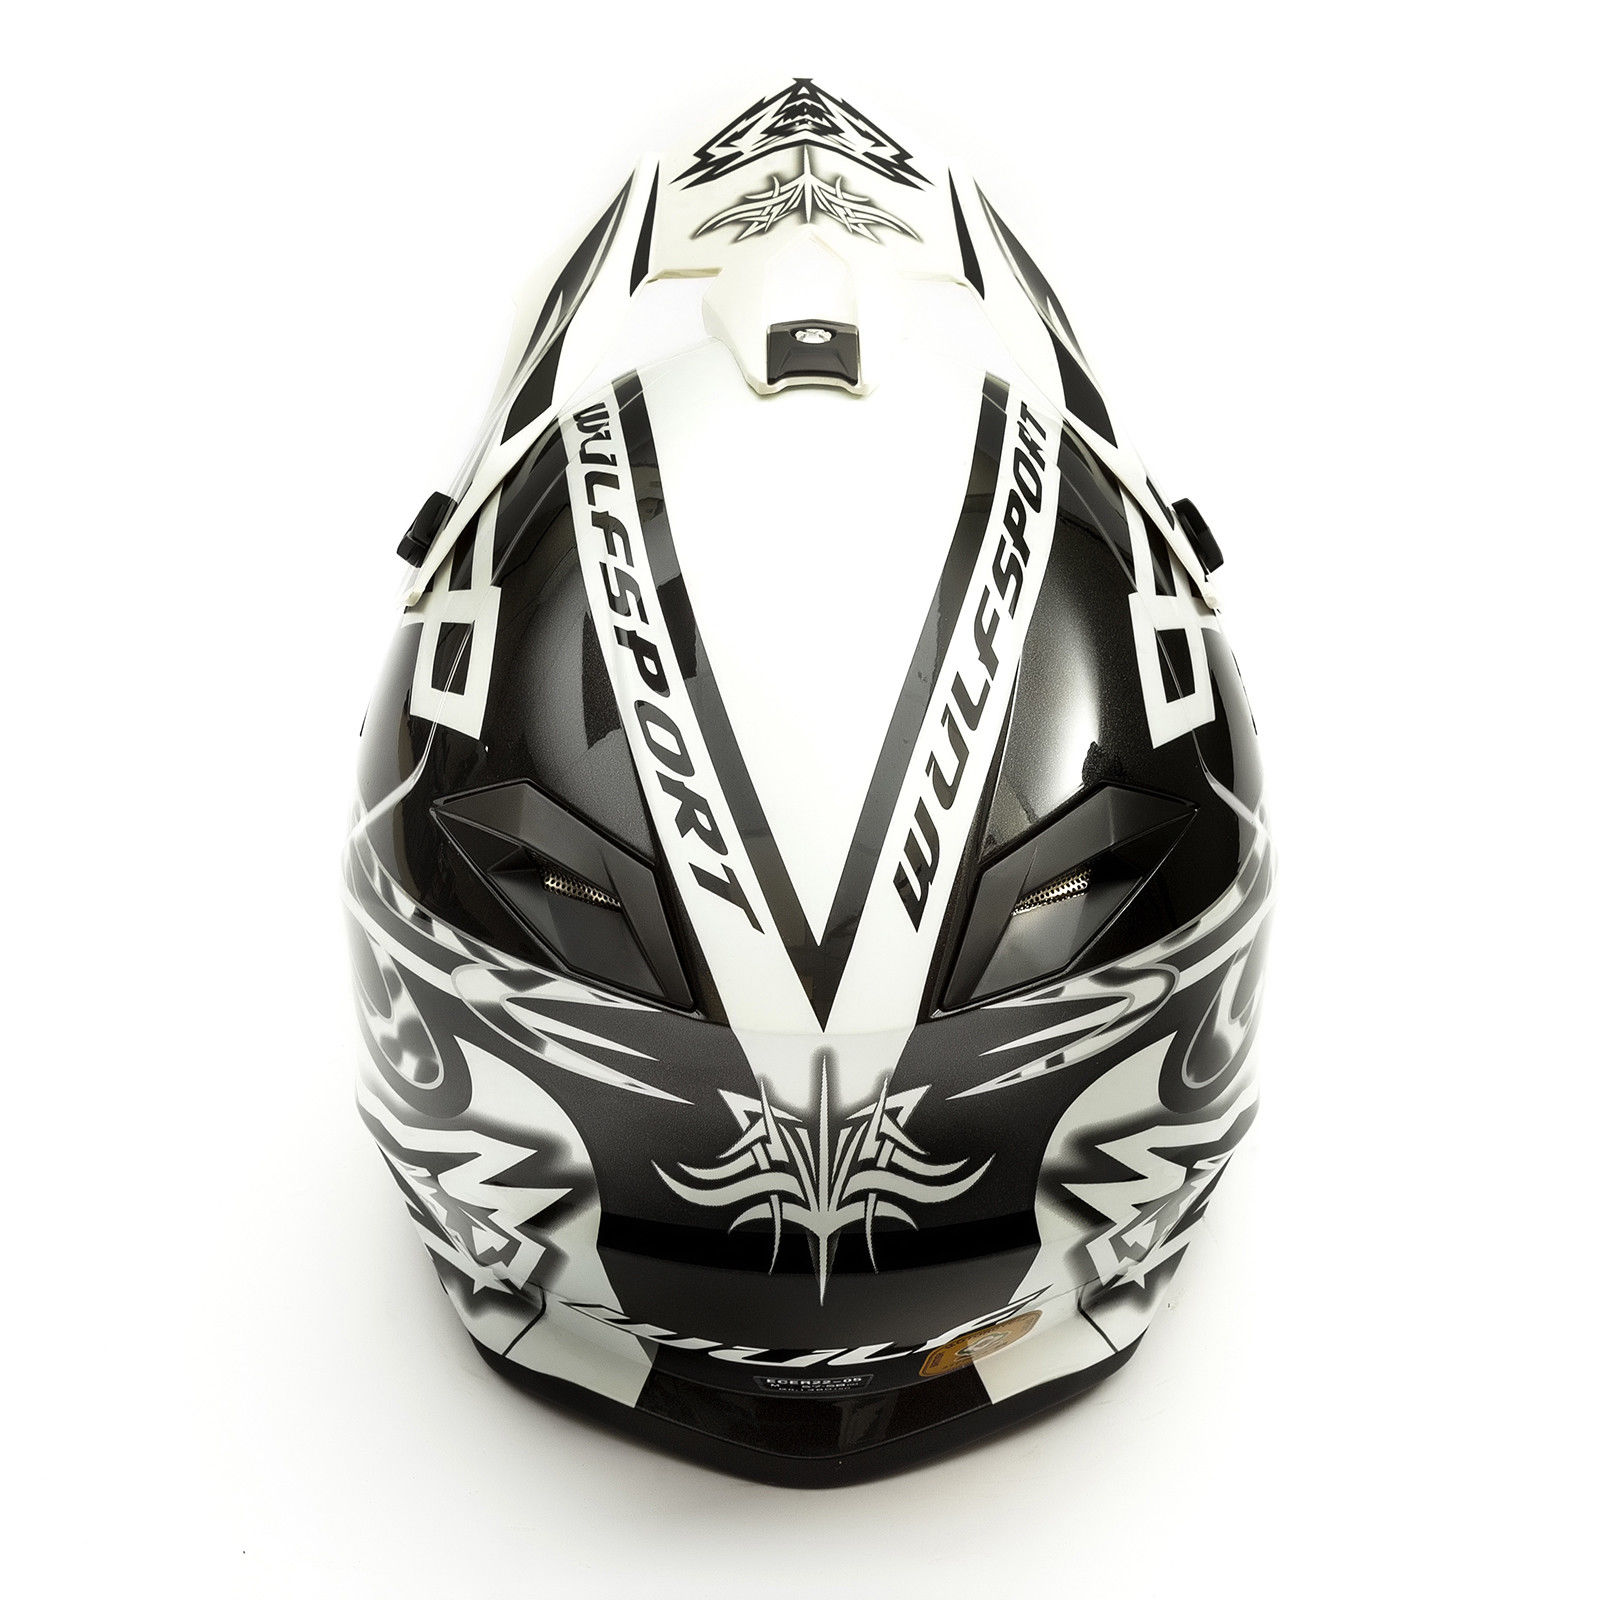 Wulfsport-Adult-Sceptre-Helmets-Motocross-Pitbike-Motorbike-Off-Road-Racing-ATV thumbnail 54